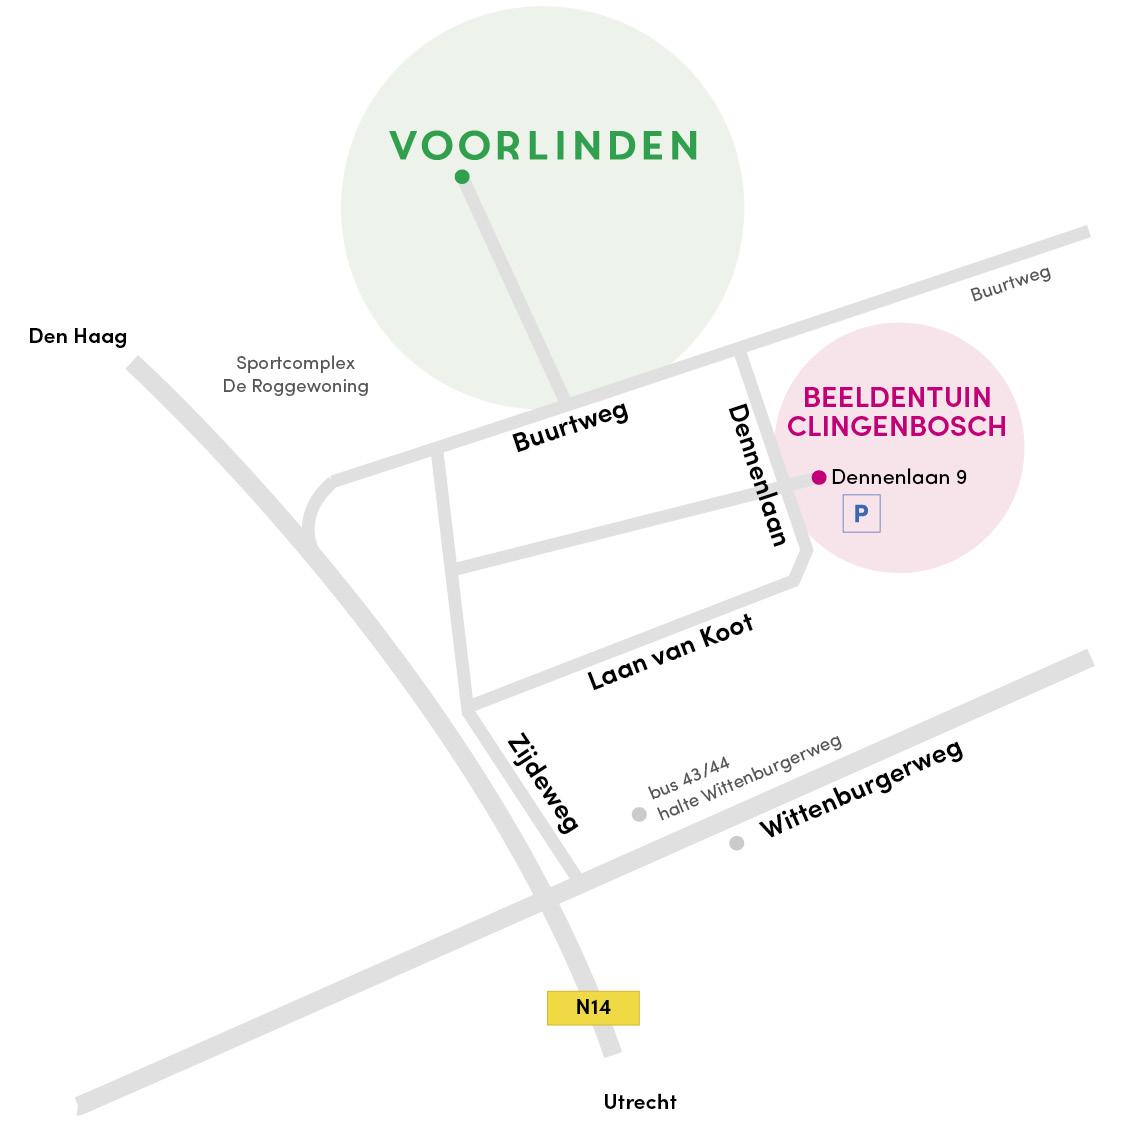 Beeldentuin_Clingenbosch_plattegrond